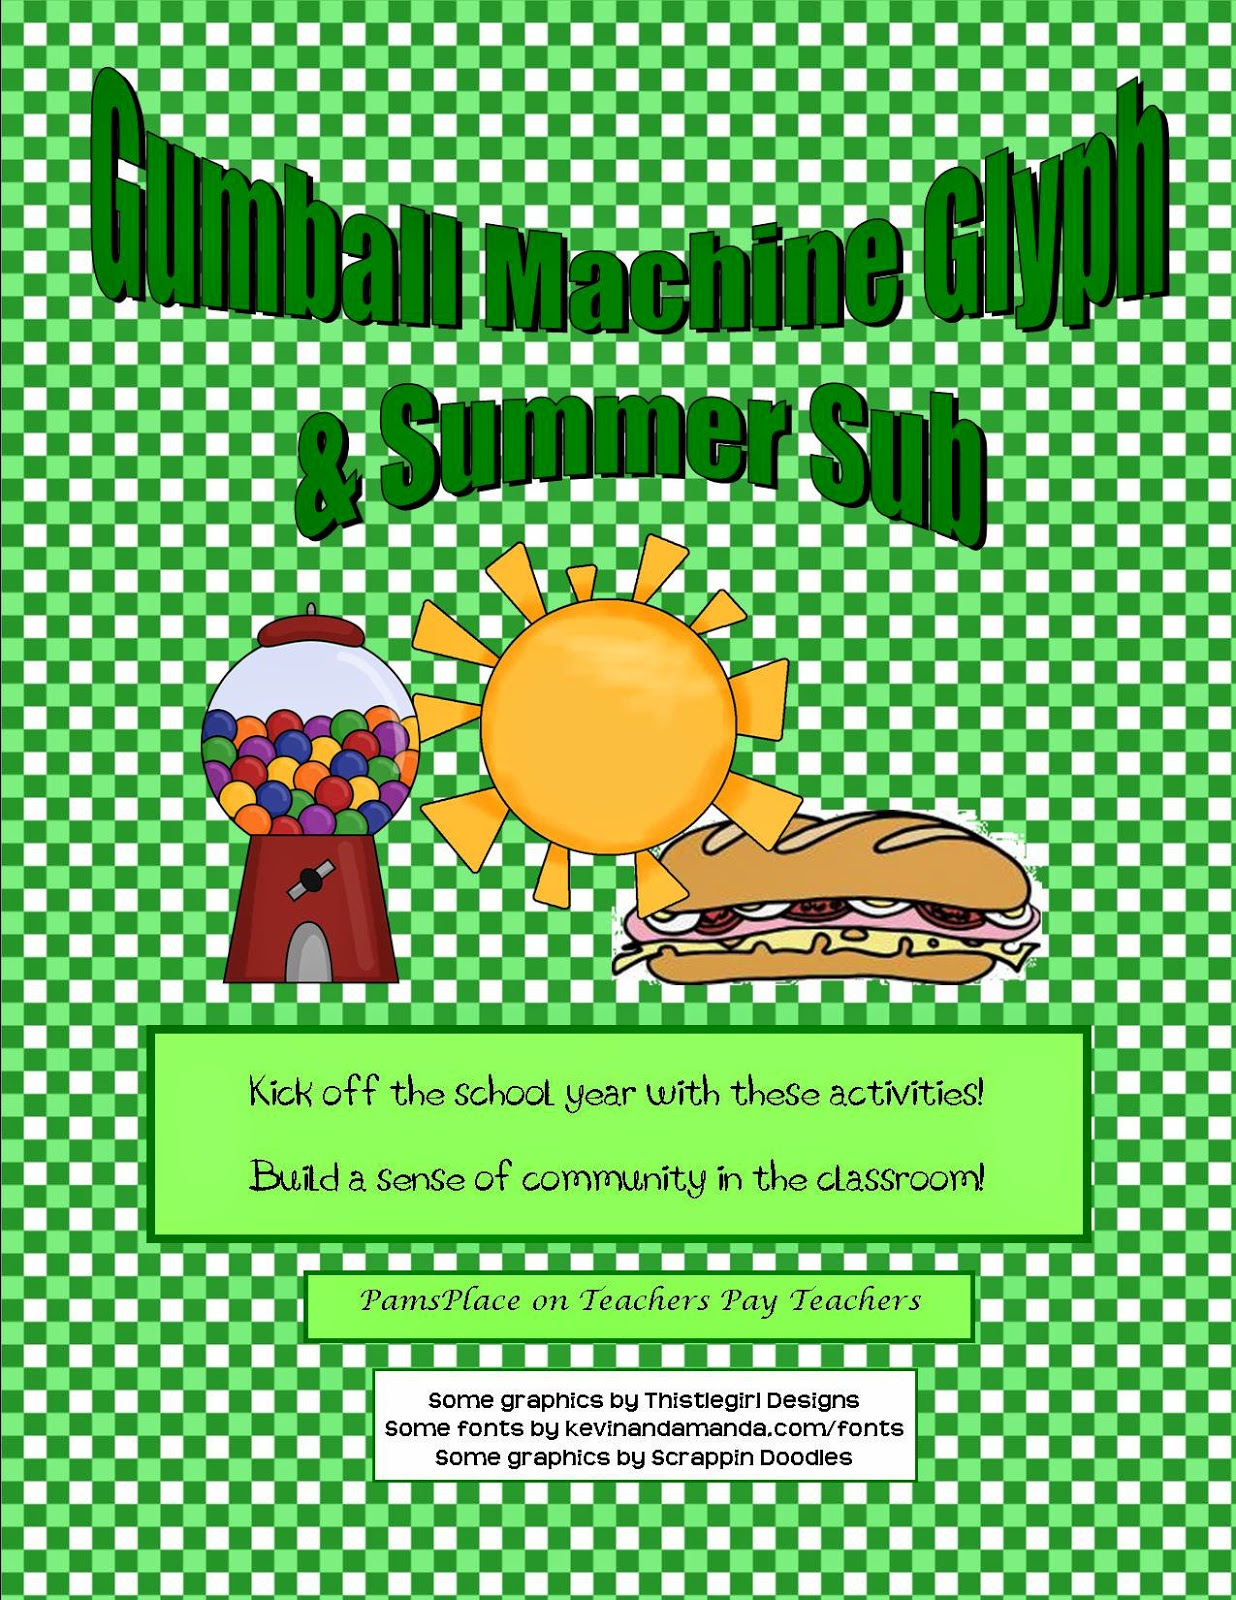 http://www.teacherspayteachers.com/Product/Back-to-School-Activities-Glyph-and-Summer-Sub-301253